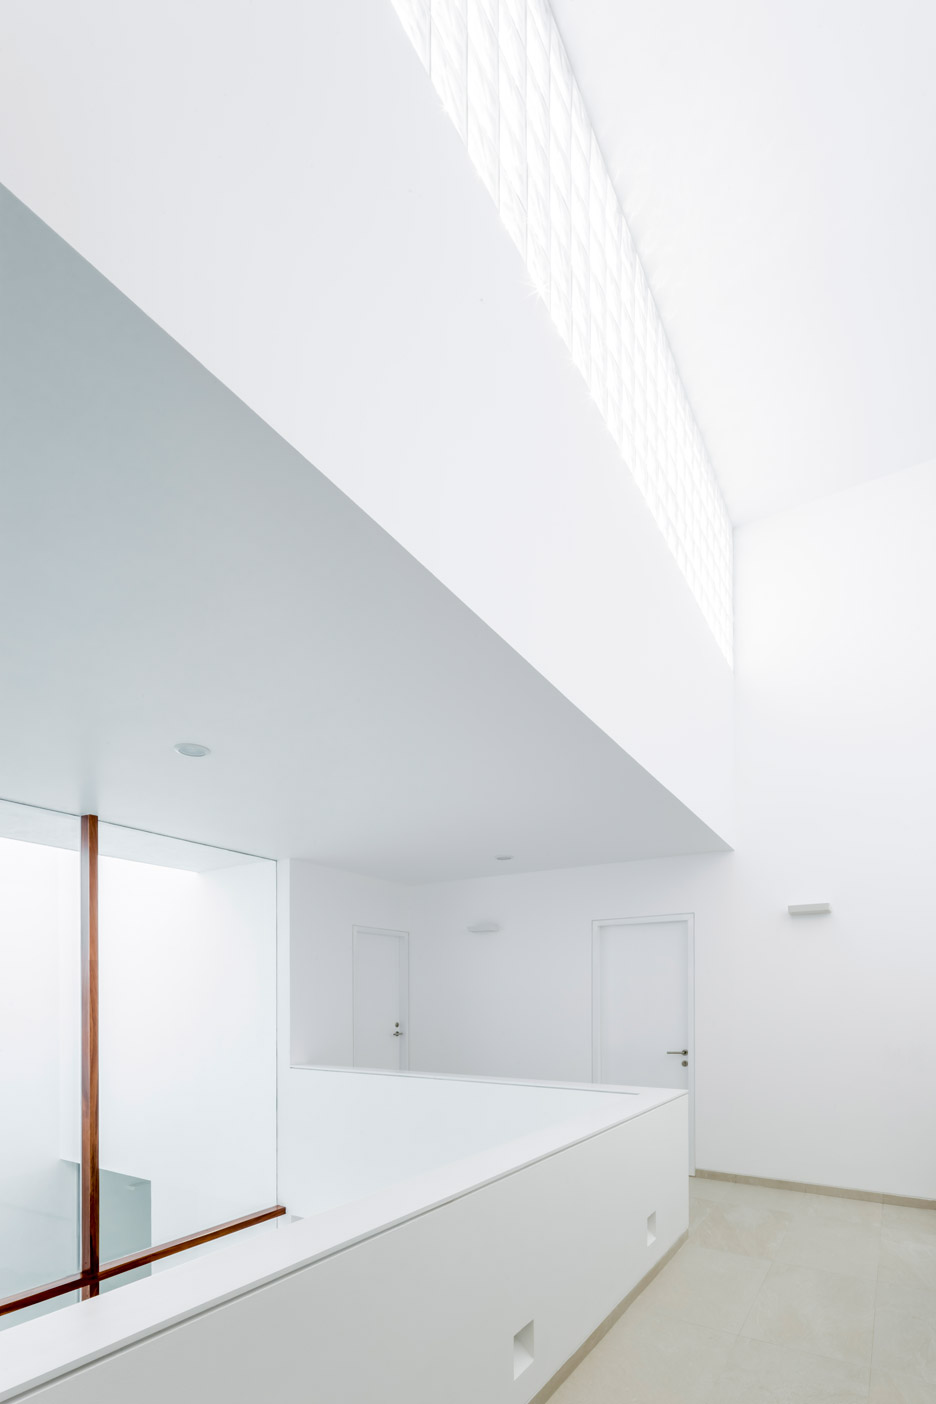 V House by Abraham Cota Paredes